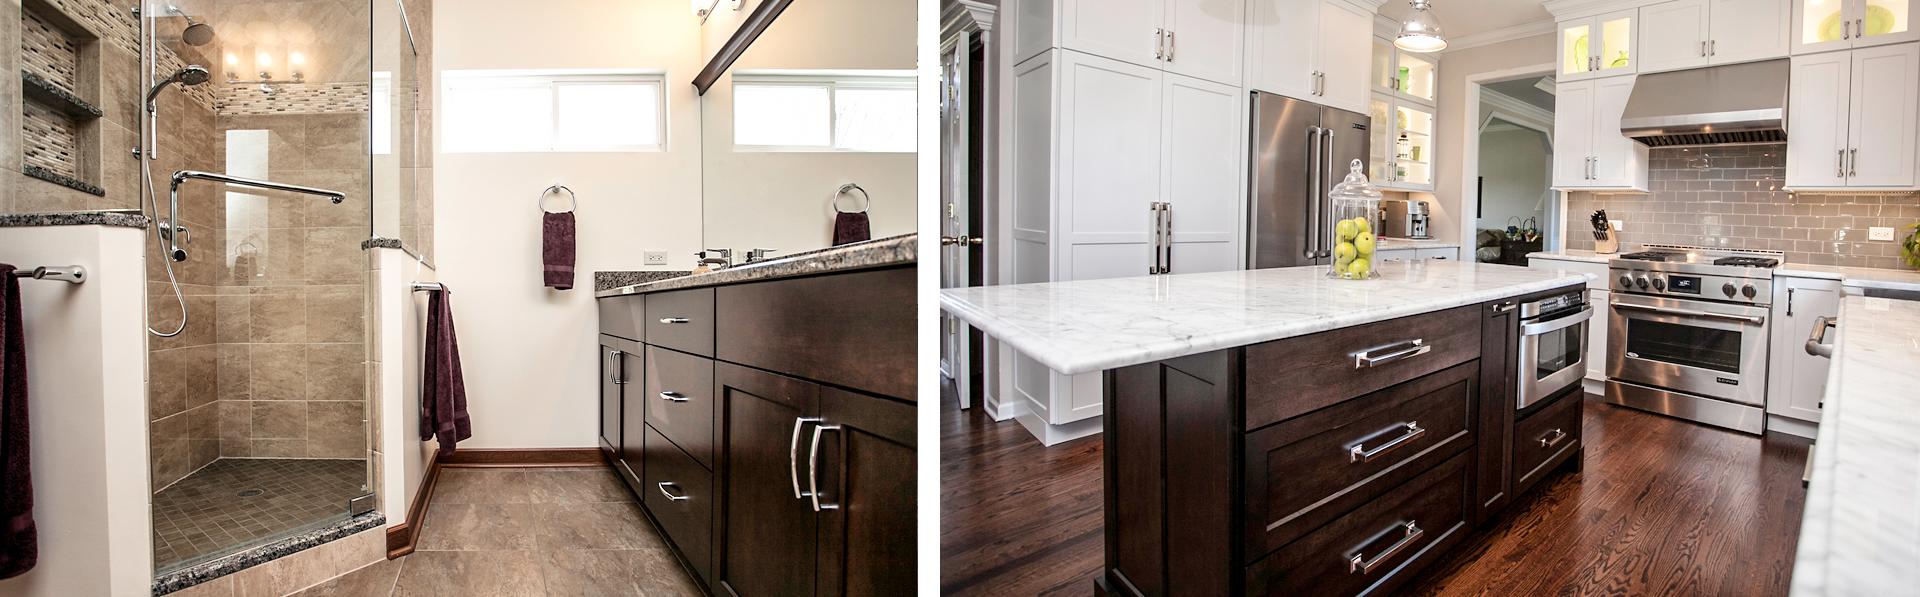 Kitchen design naperville home design plan Kitchen design and remodeling aurora